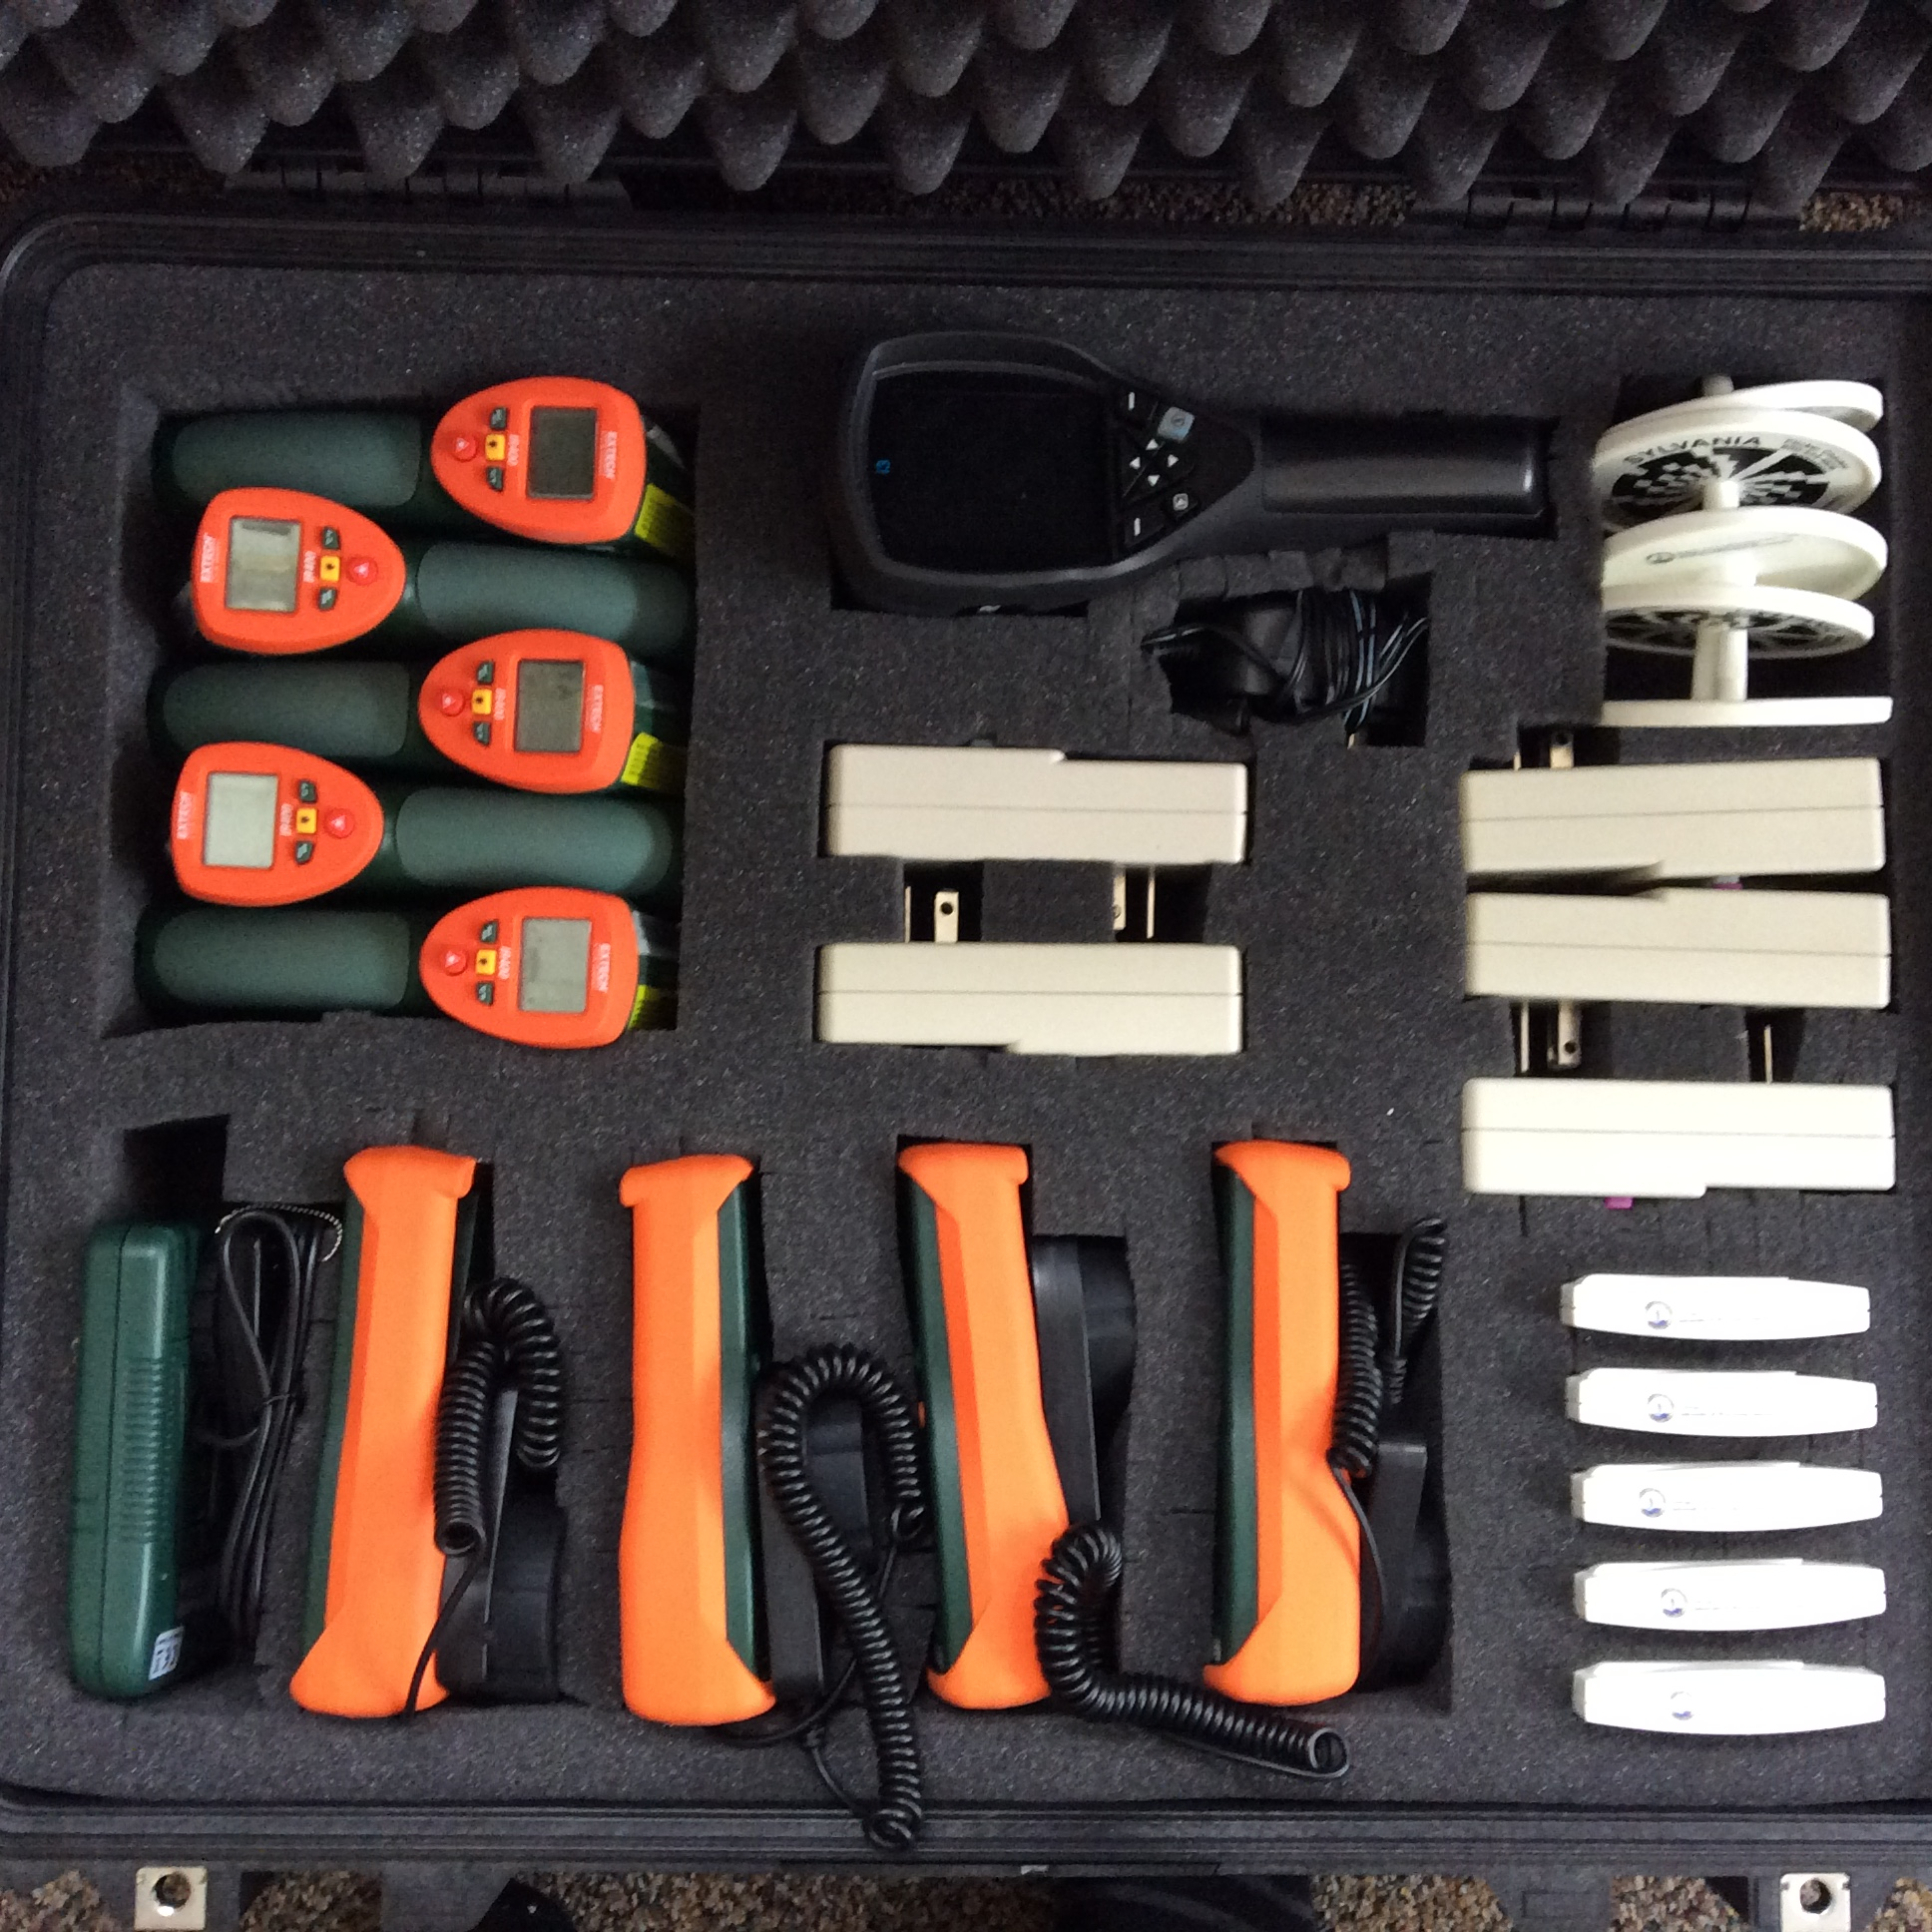 Trunks Amp Kits